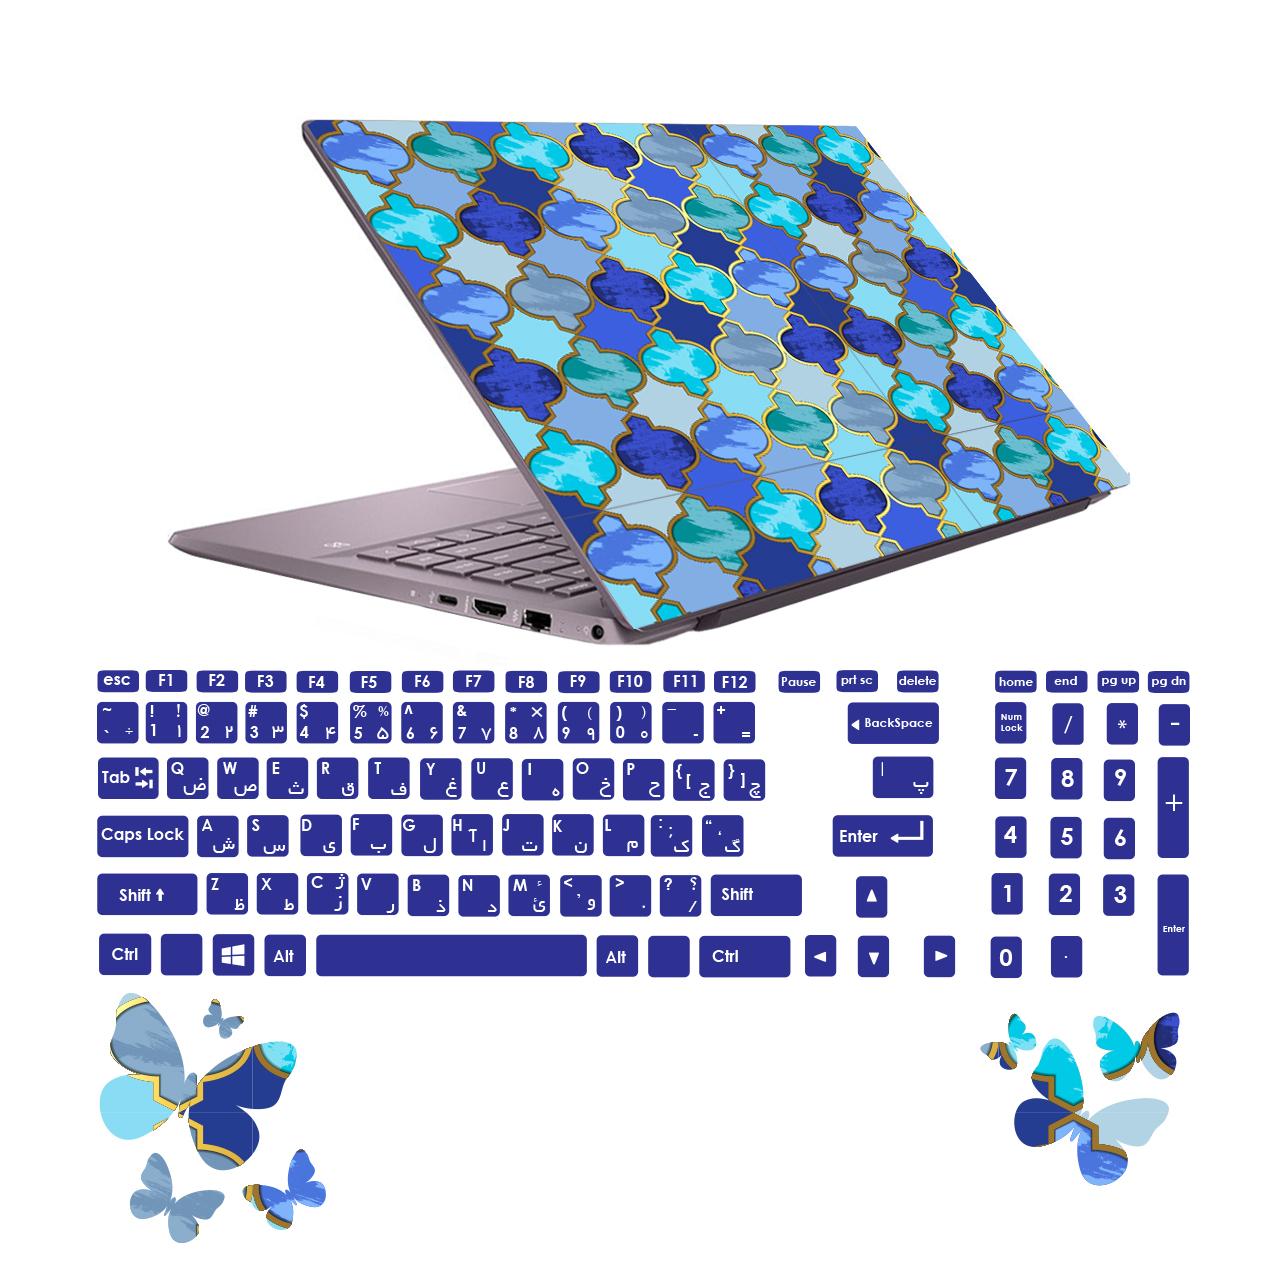 استیکر لپ تاپ صالسو آرت مدل 5028 hk به همراه برچسب حروف فارسی کیبورد